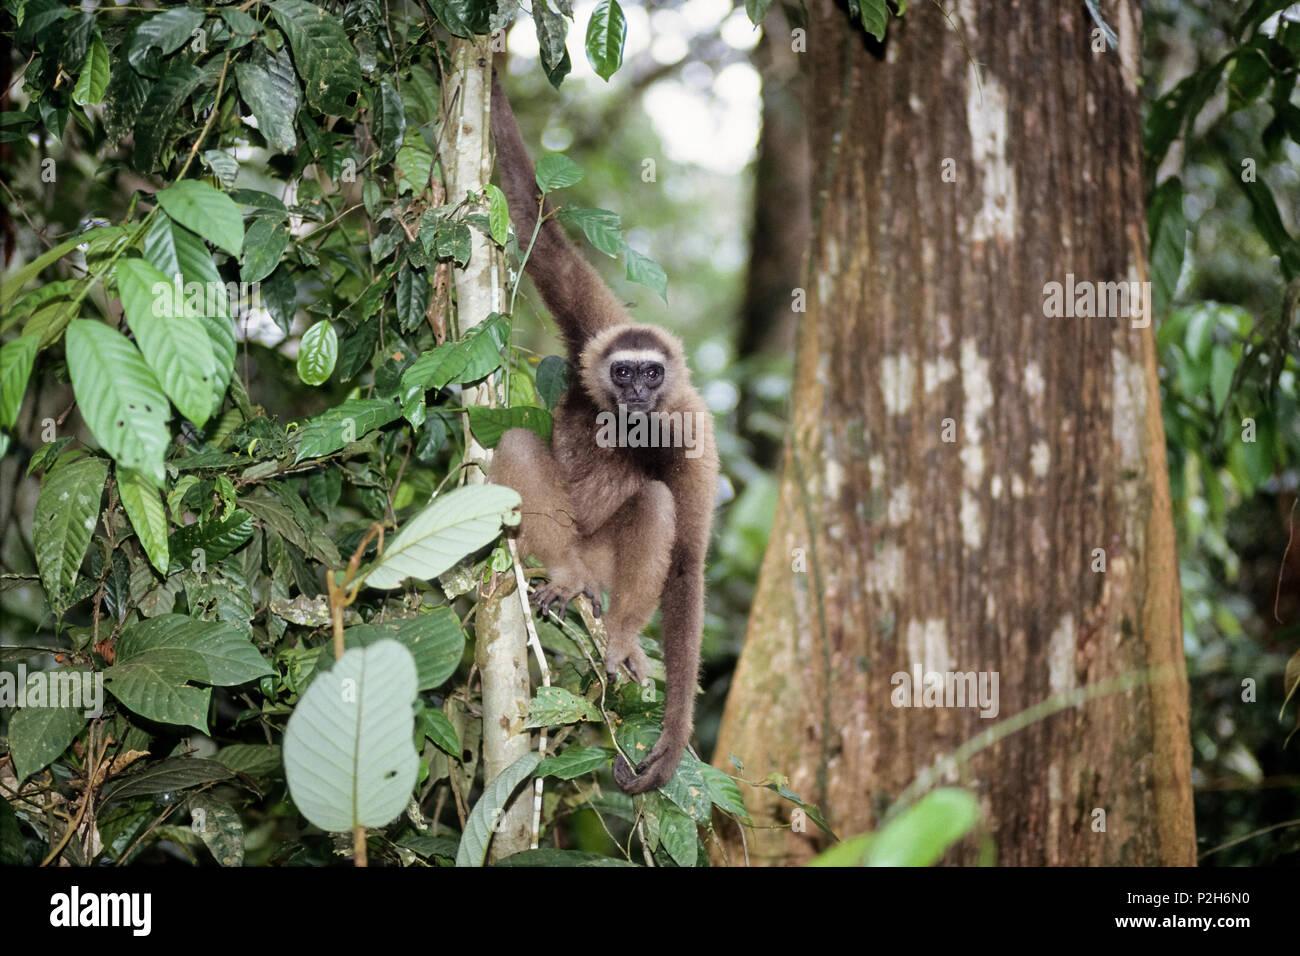 East Bornean Gray Gibbon in rainforest, Hylobates funereus, Sabah, Borneo, Malaysia - Stock Image